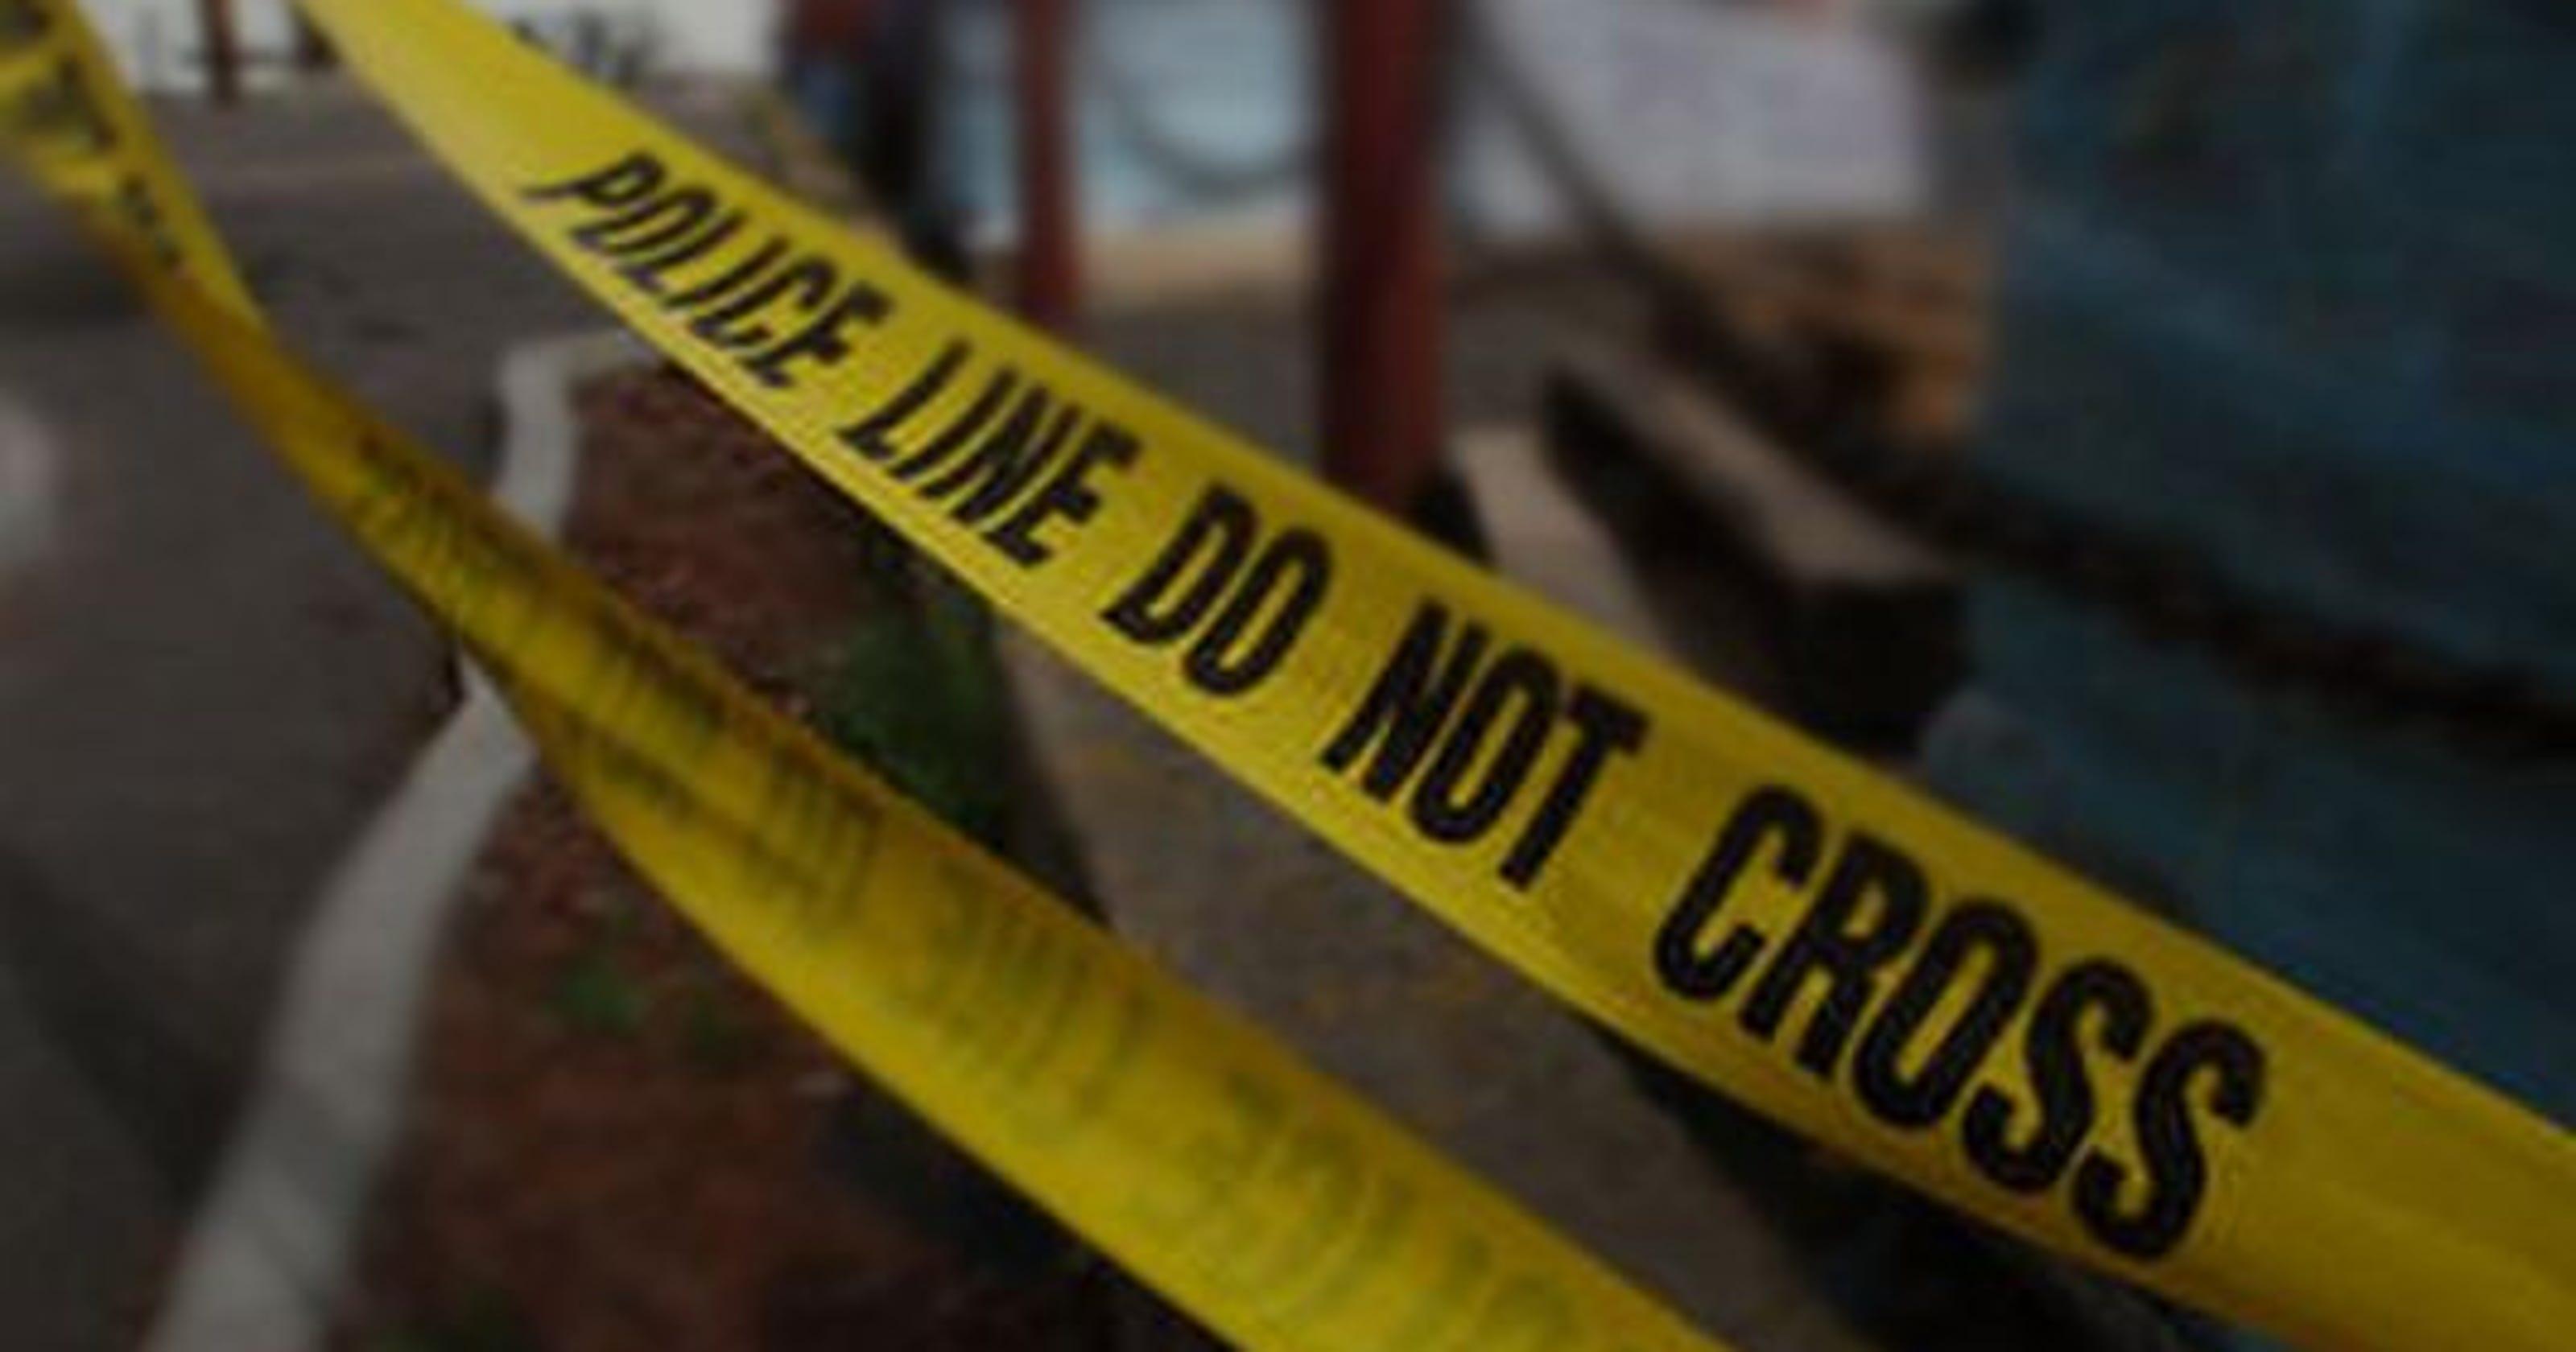 Deaths in car accidents increase in Colorado